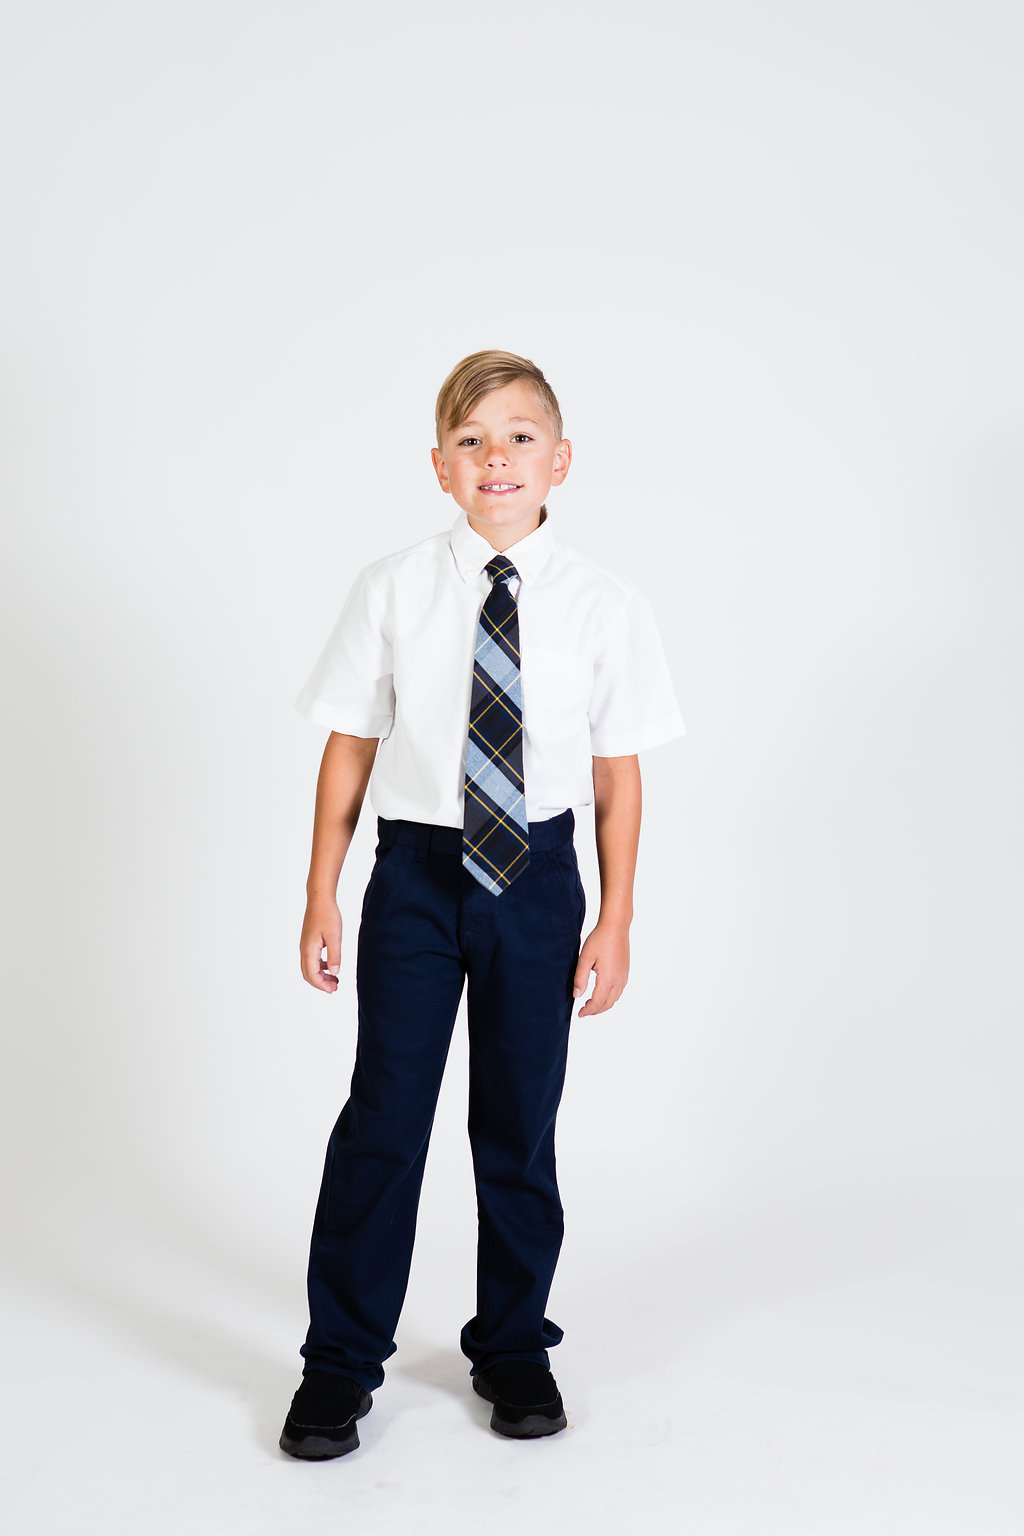 16JuneWCA_Uniforms149-Edit.jpg